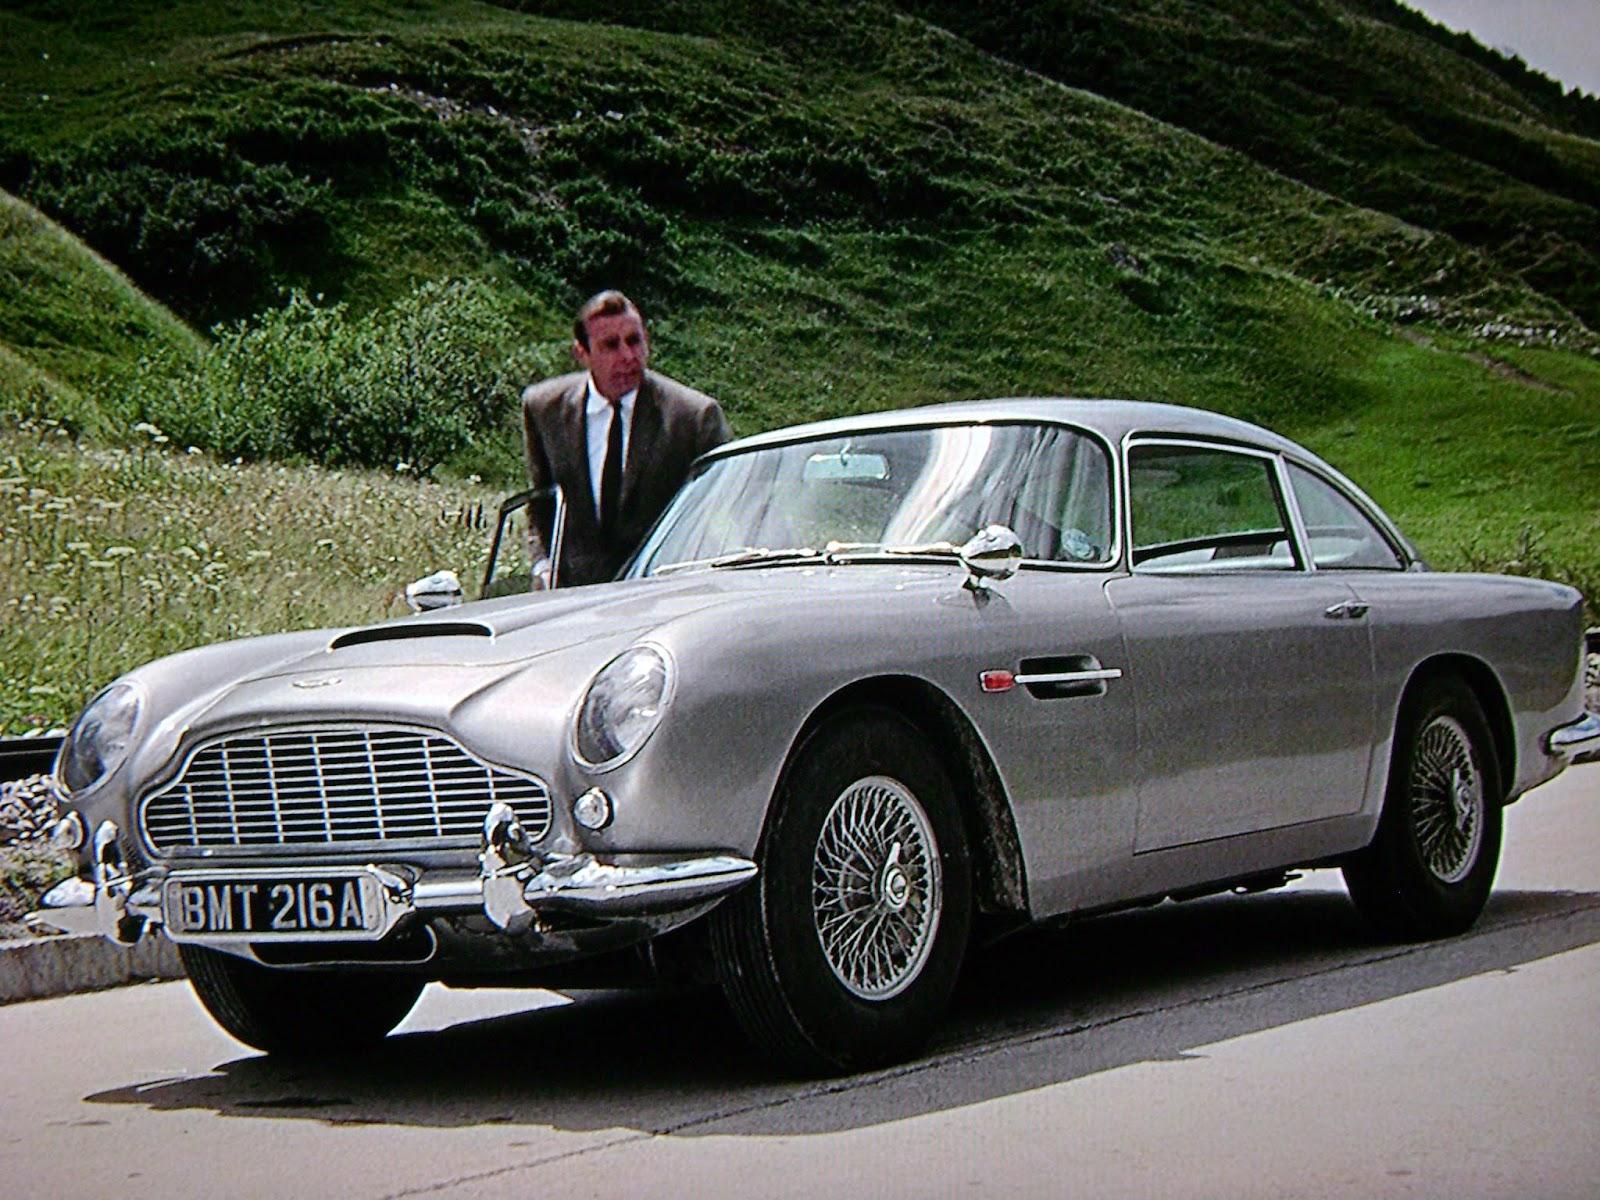 007 Aston Martin Db5 Goldfinger Car